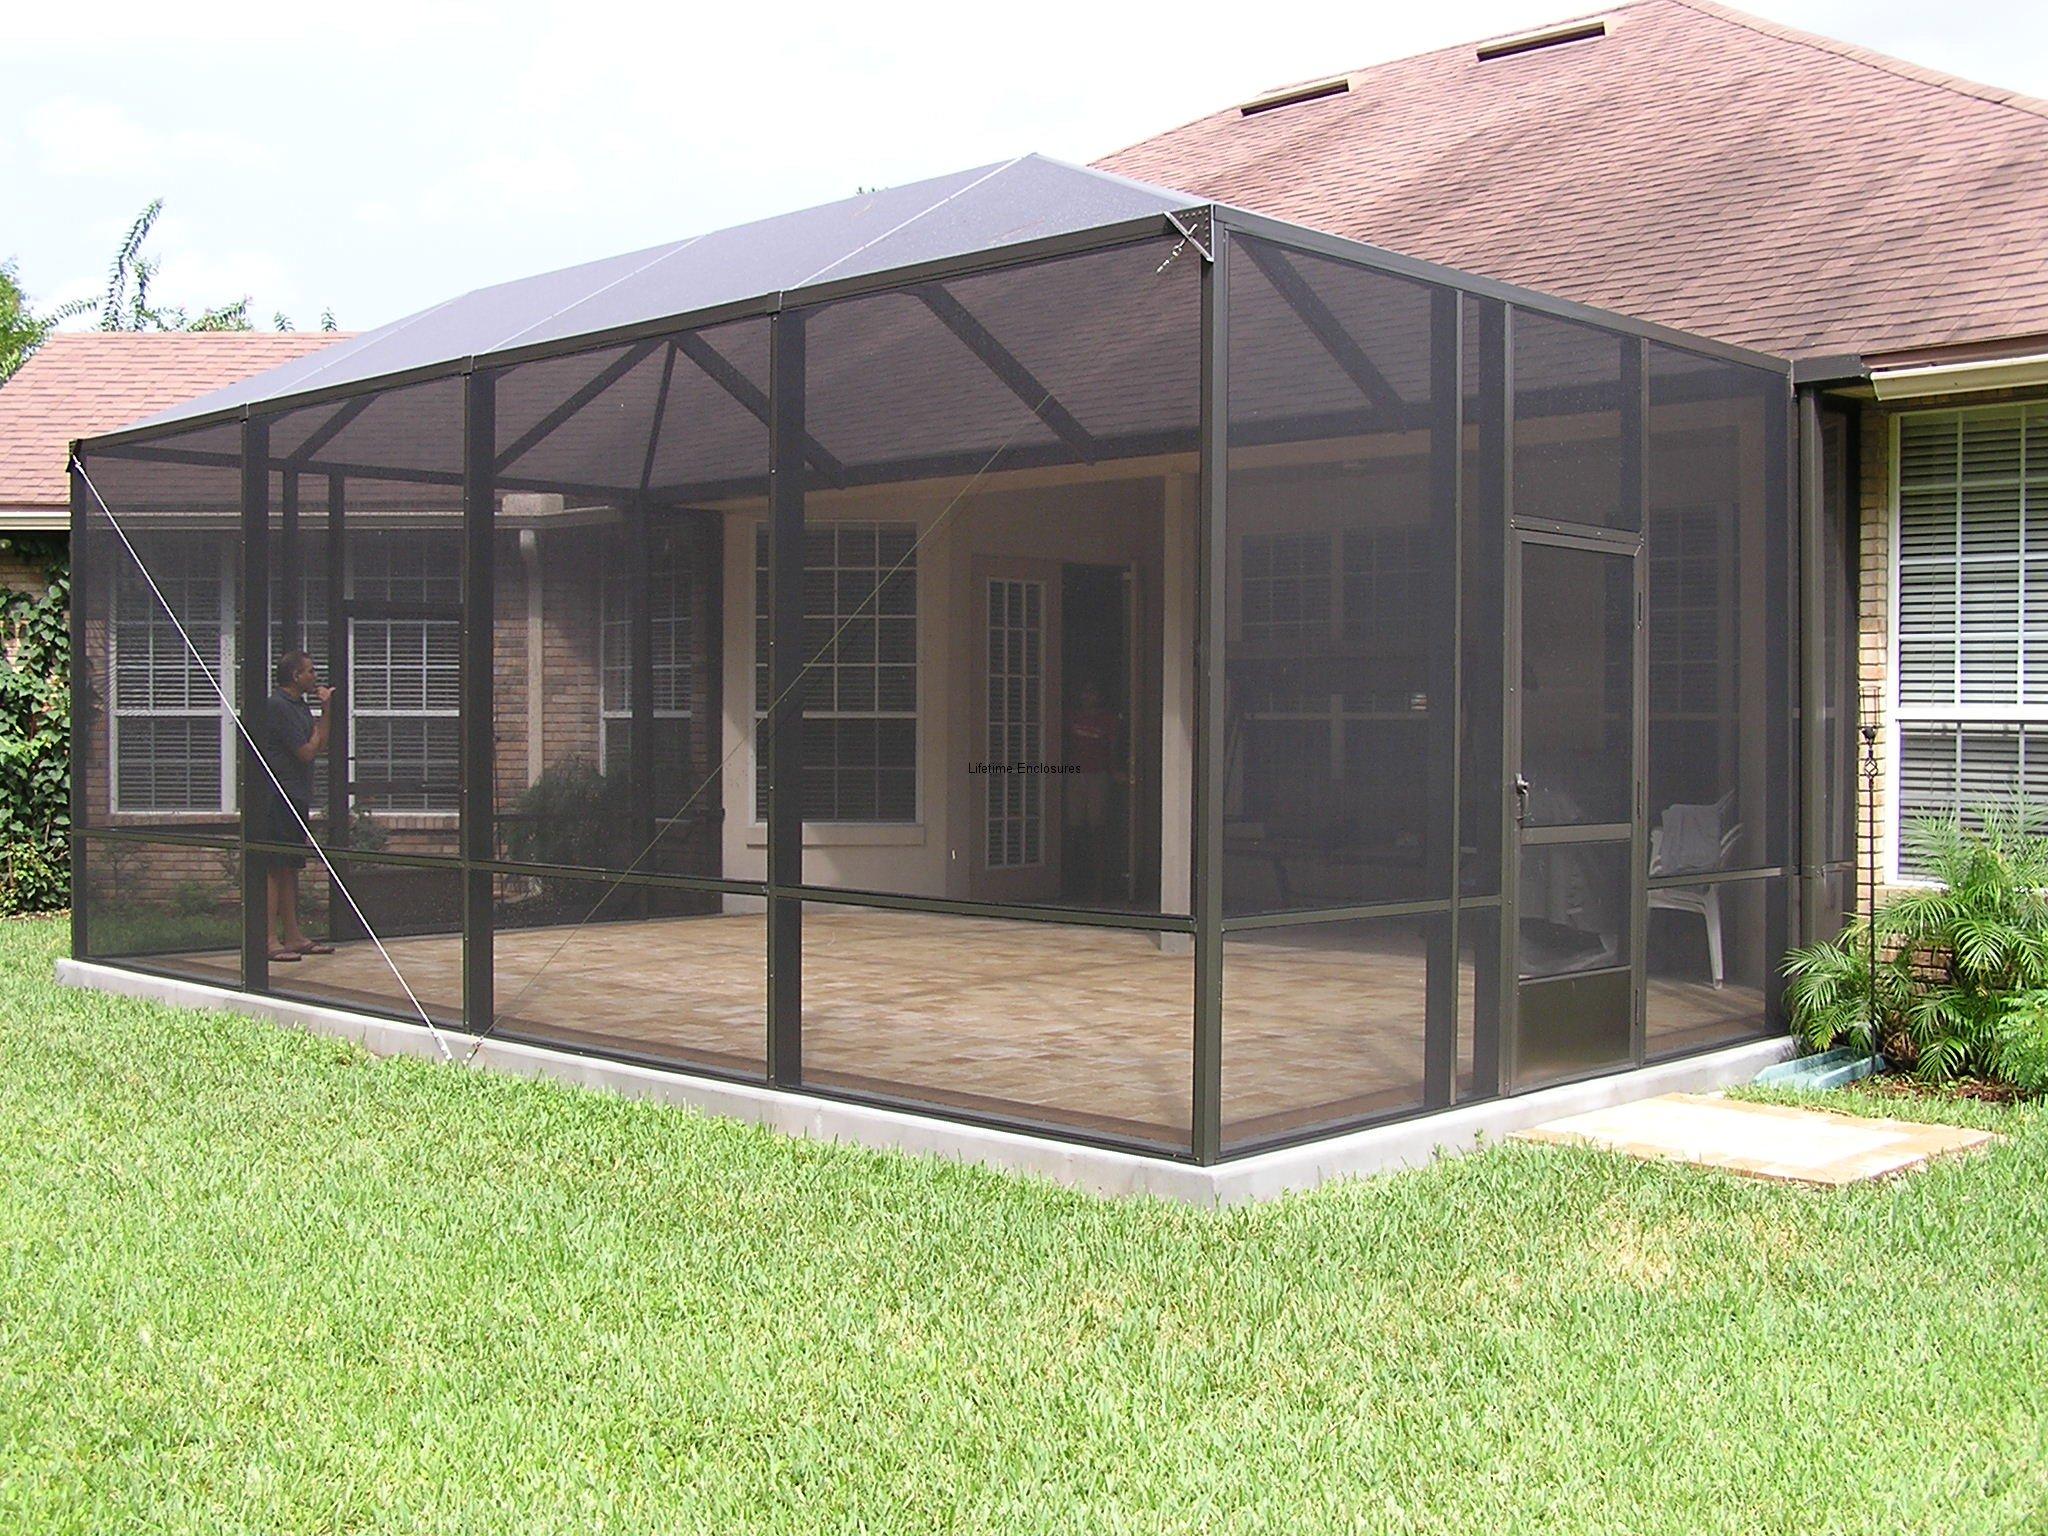 Design A Screened In Patio | Joy Studio Design Gallery ... on Backyard Patio Enclosure Ideas  id=54965